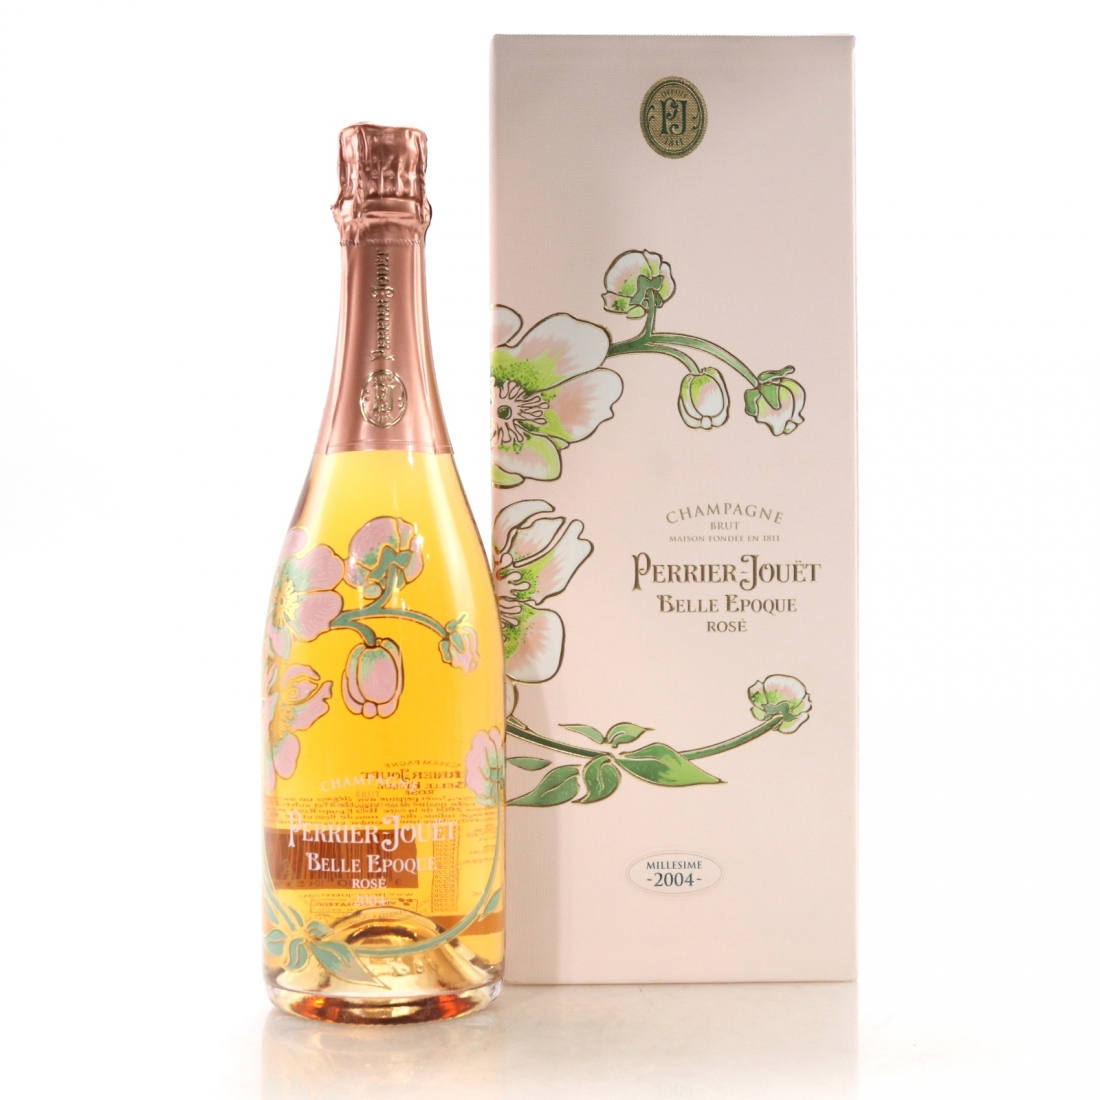 Perrier-Jouet Belle Epoque 2004 Rose Champagne